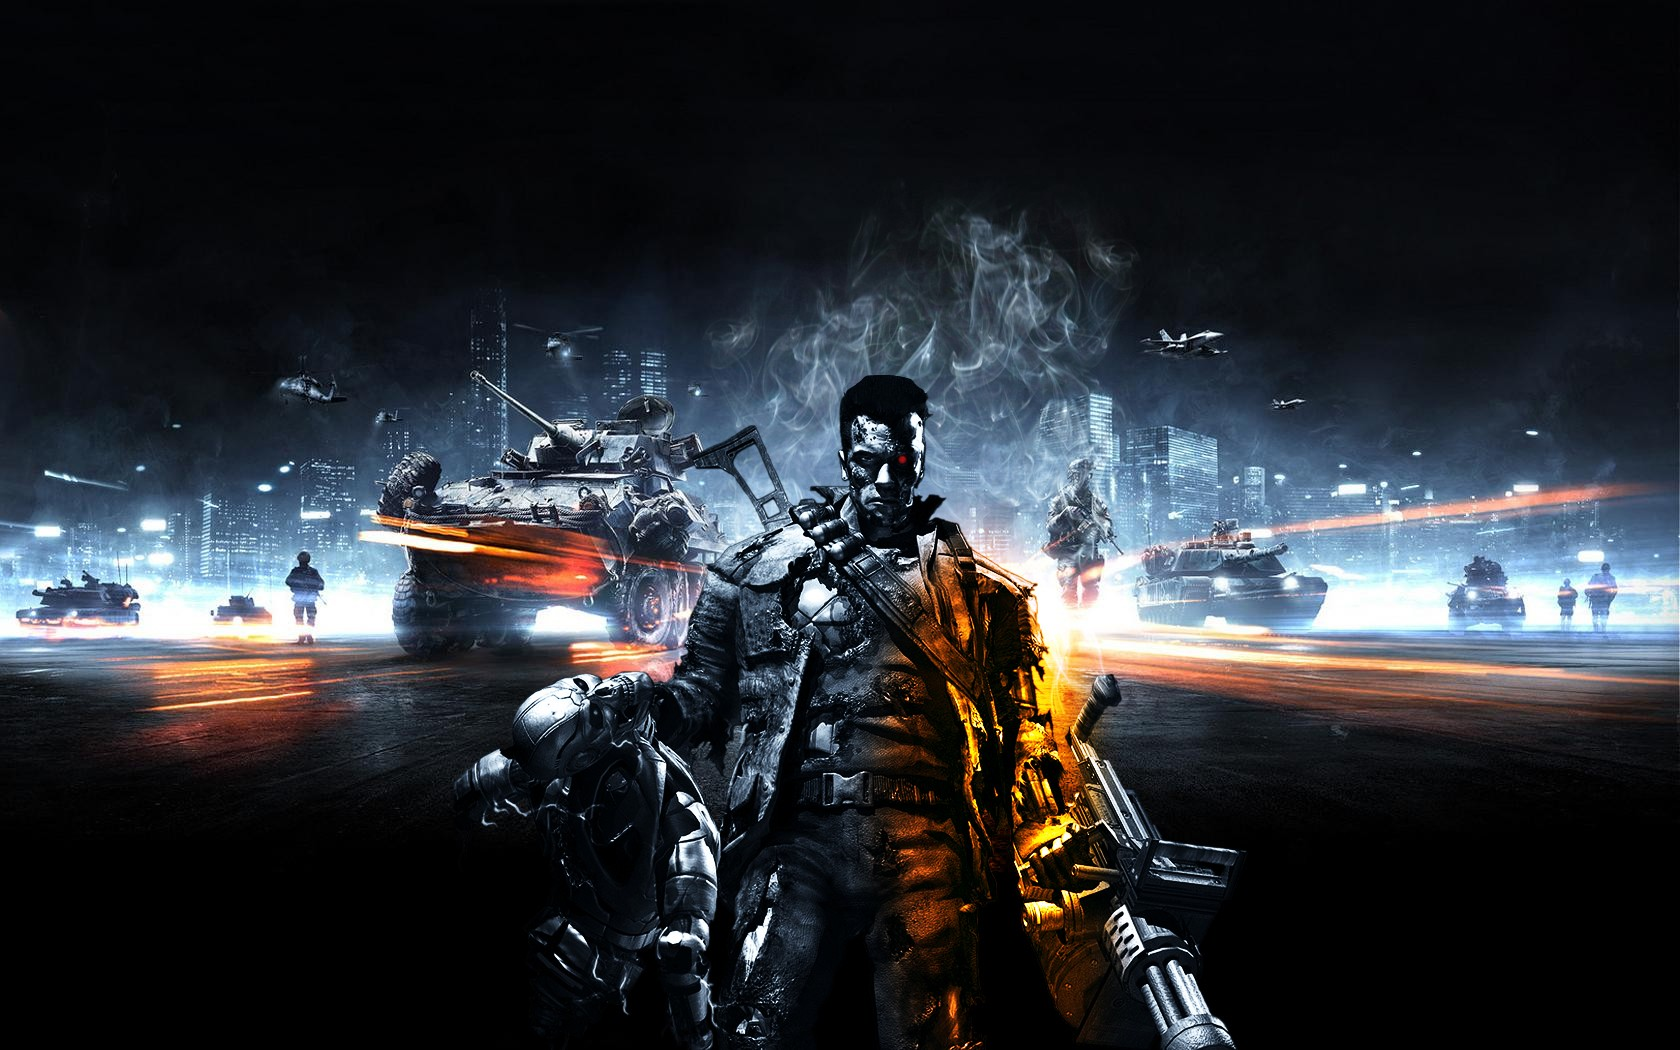 Terminator Battlefield 3 By Paullus23 On DeviantArt